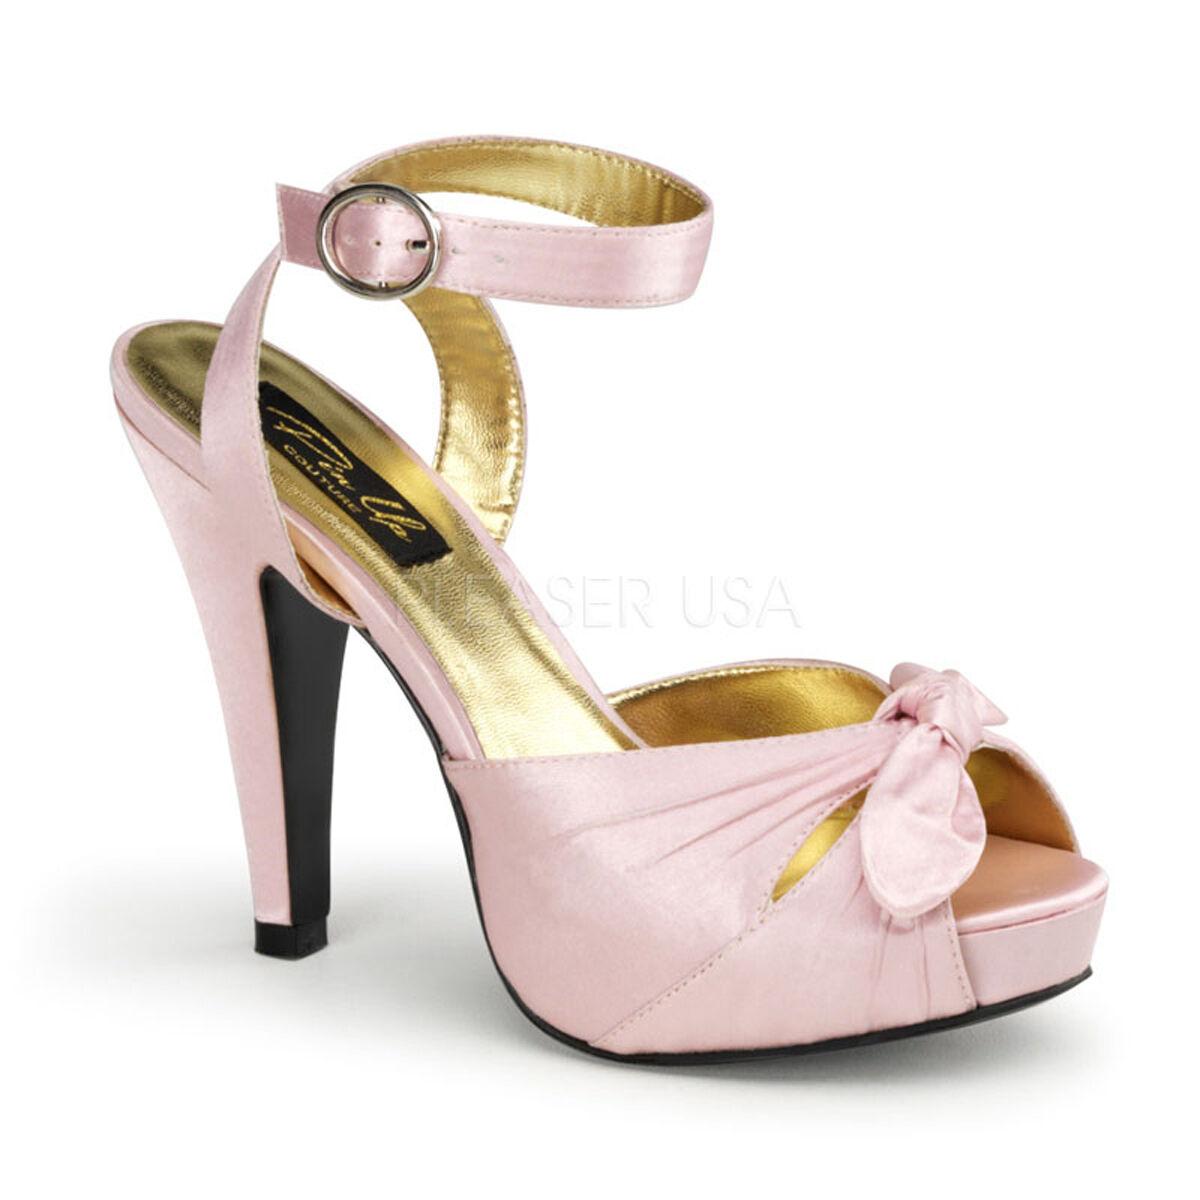 Sexy Schuhes Baby Pink Pleated Satin Platform Sandales Retro 50's Heels BETT04/BPSA